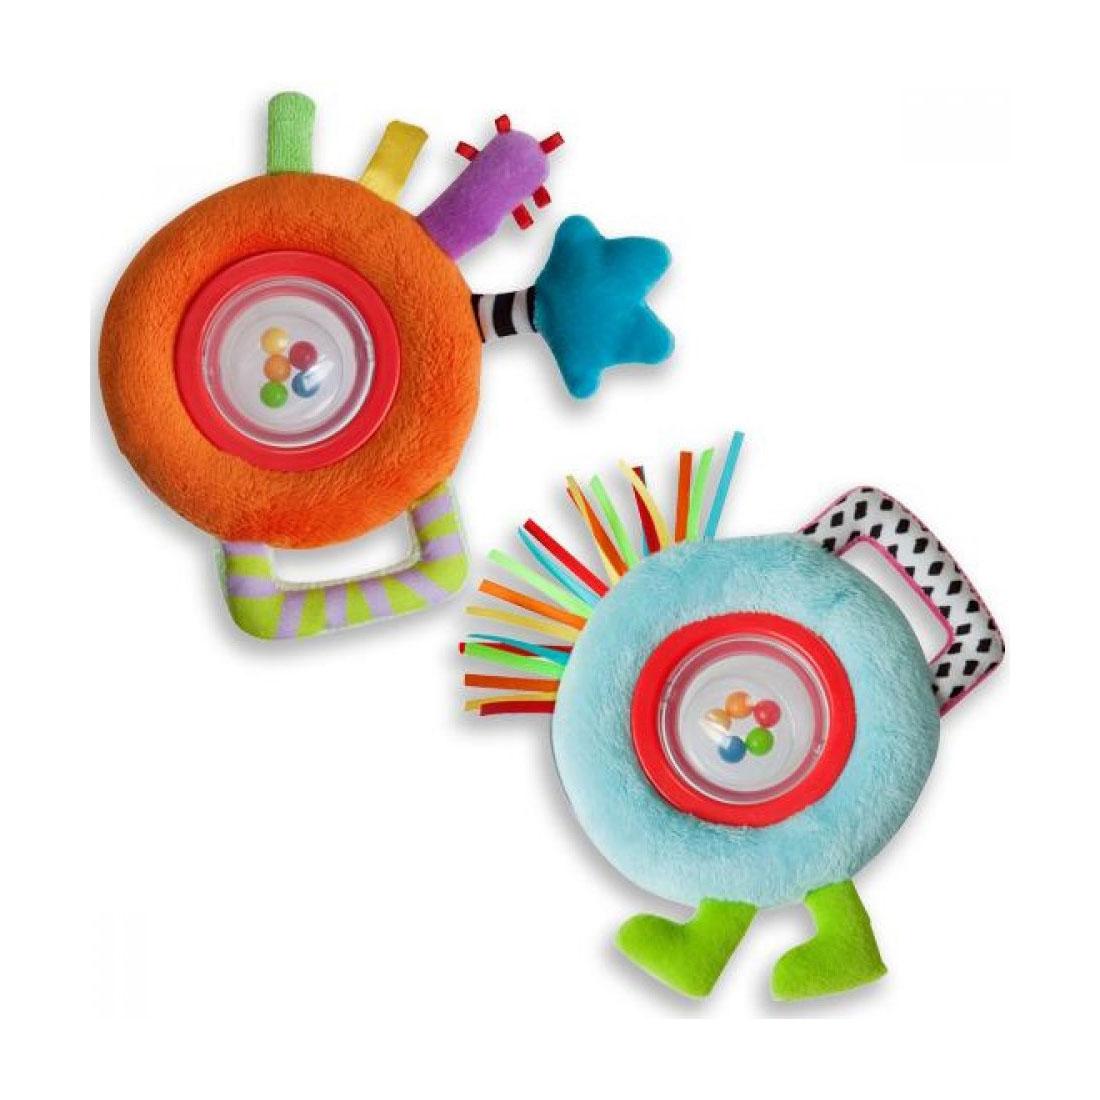 ���������� Taf Toys ���������� � ������������ (2 ����)